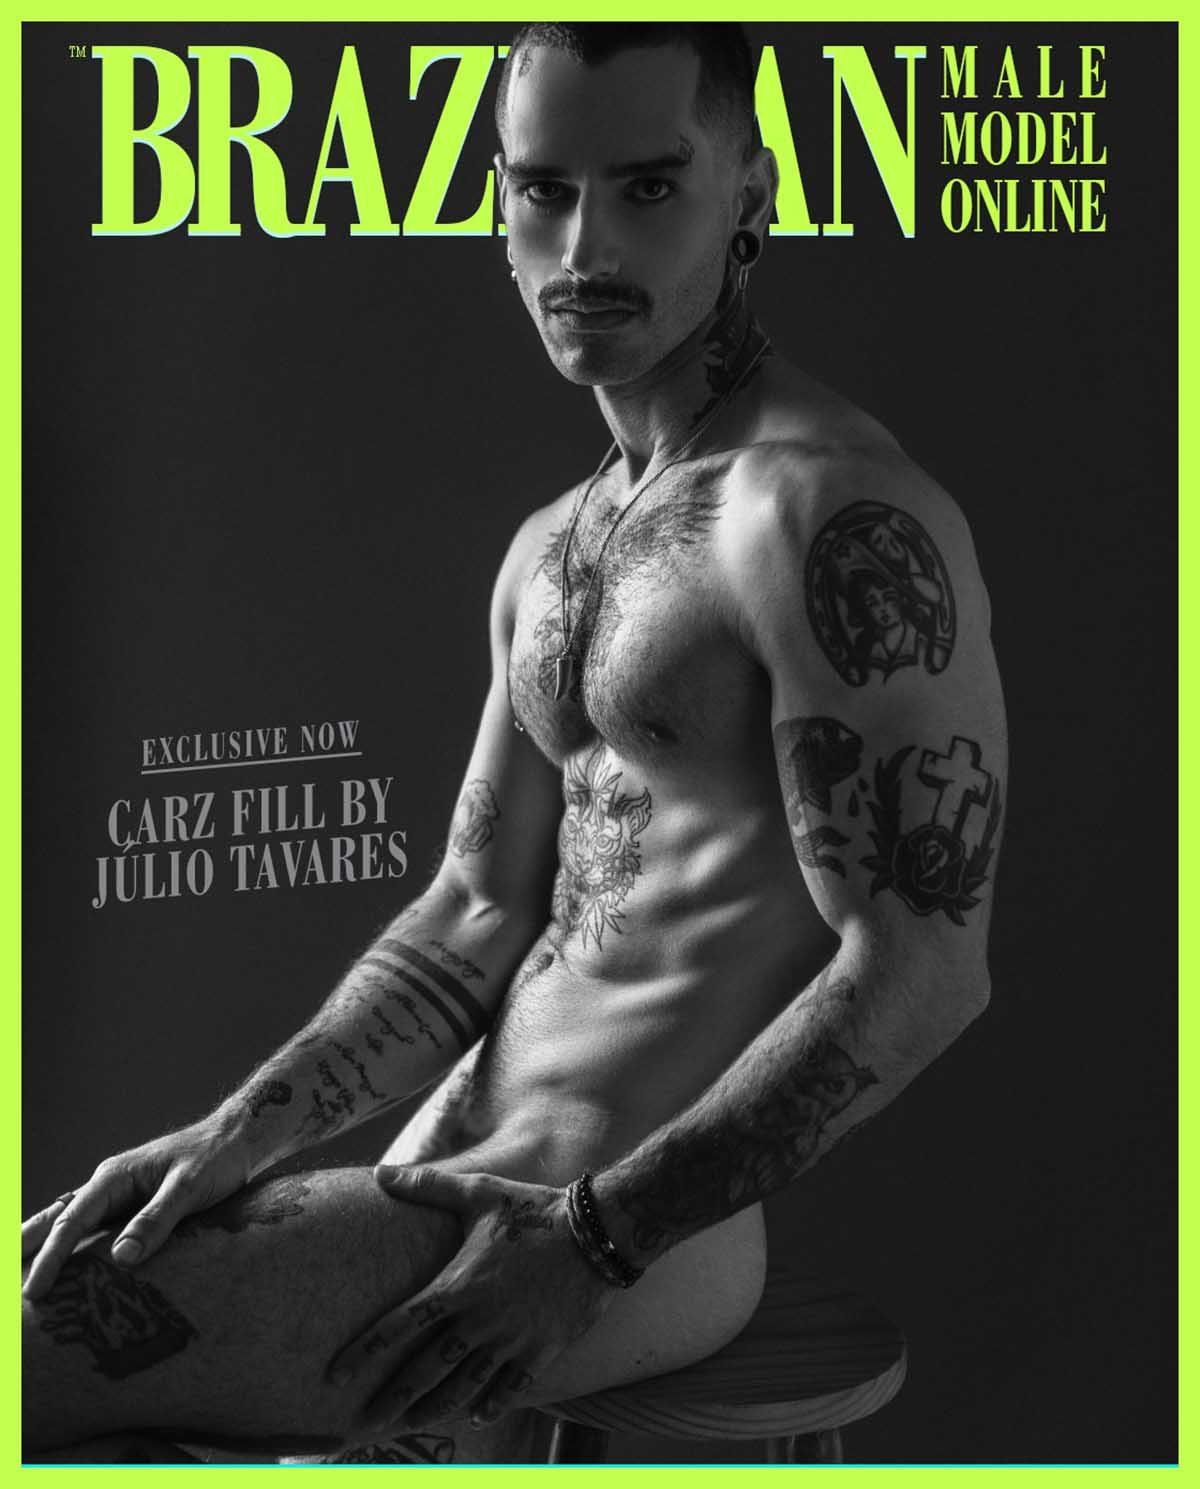 Carz Fill by Júlio Tavares